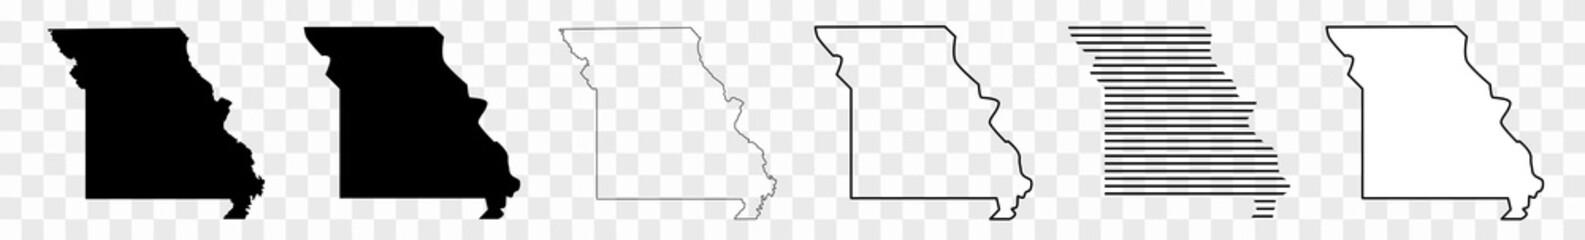 Missouri Map Black | State Border | United States | US America | Transparent Isolated | Variations